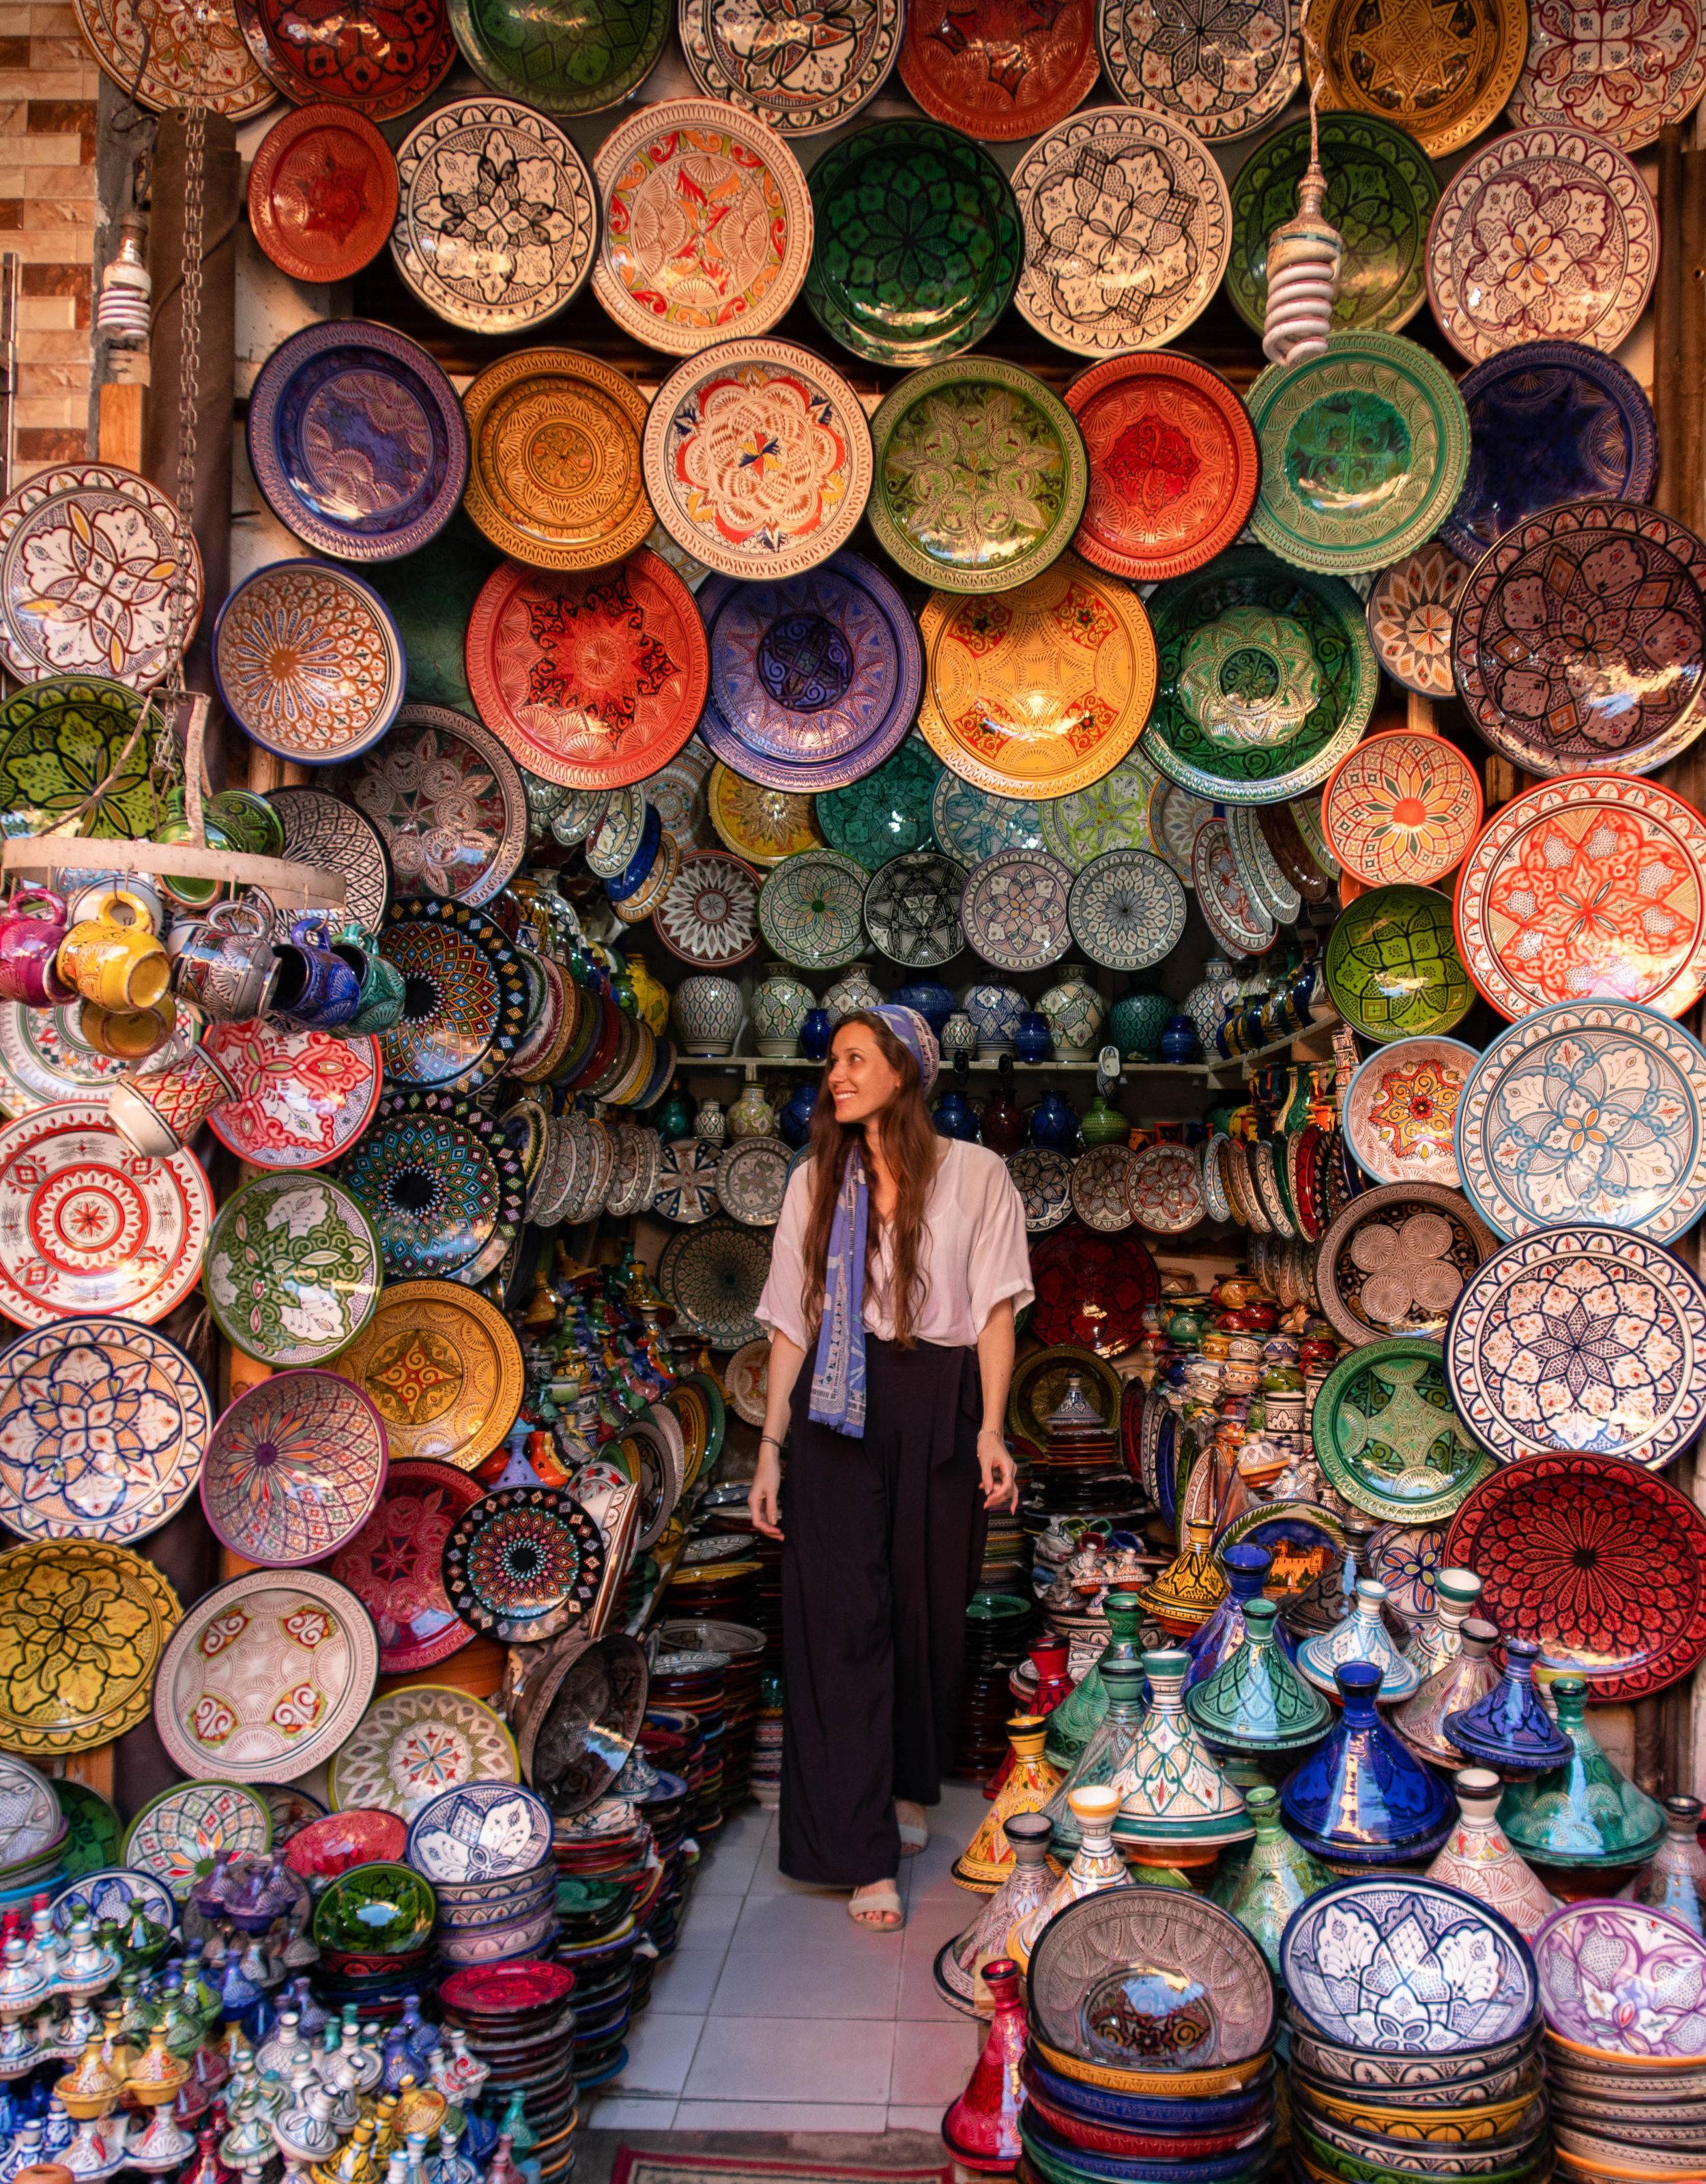 Carina Otero in Marrakech, Morocco.